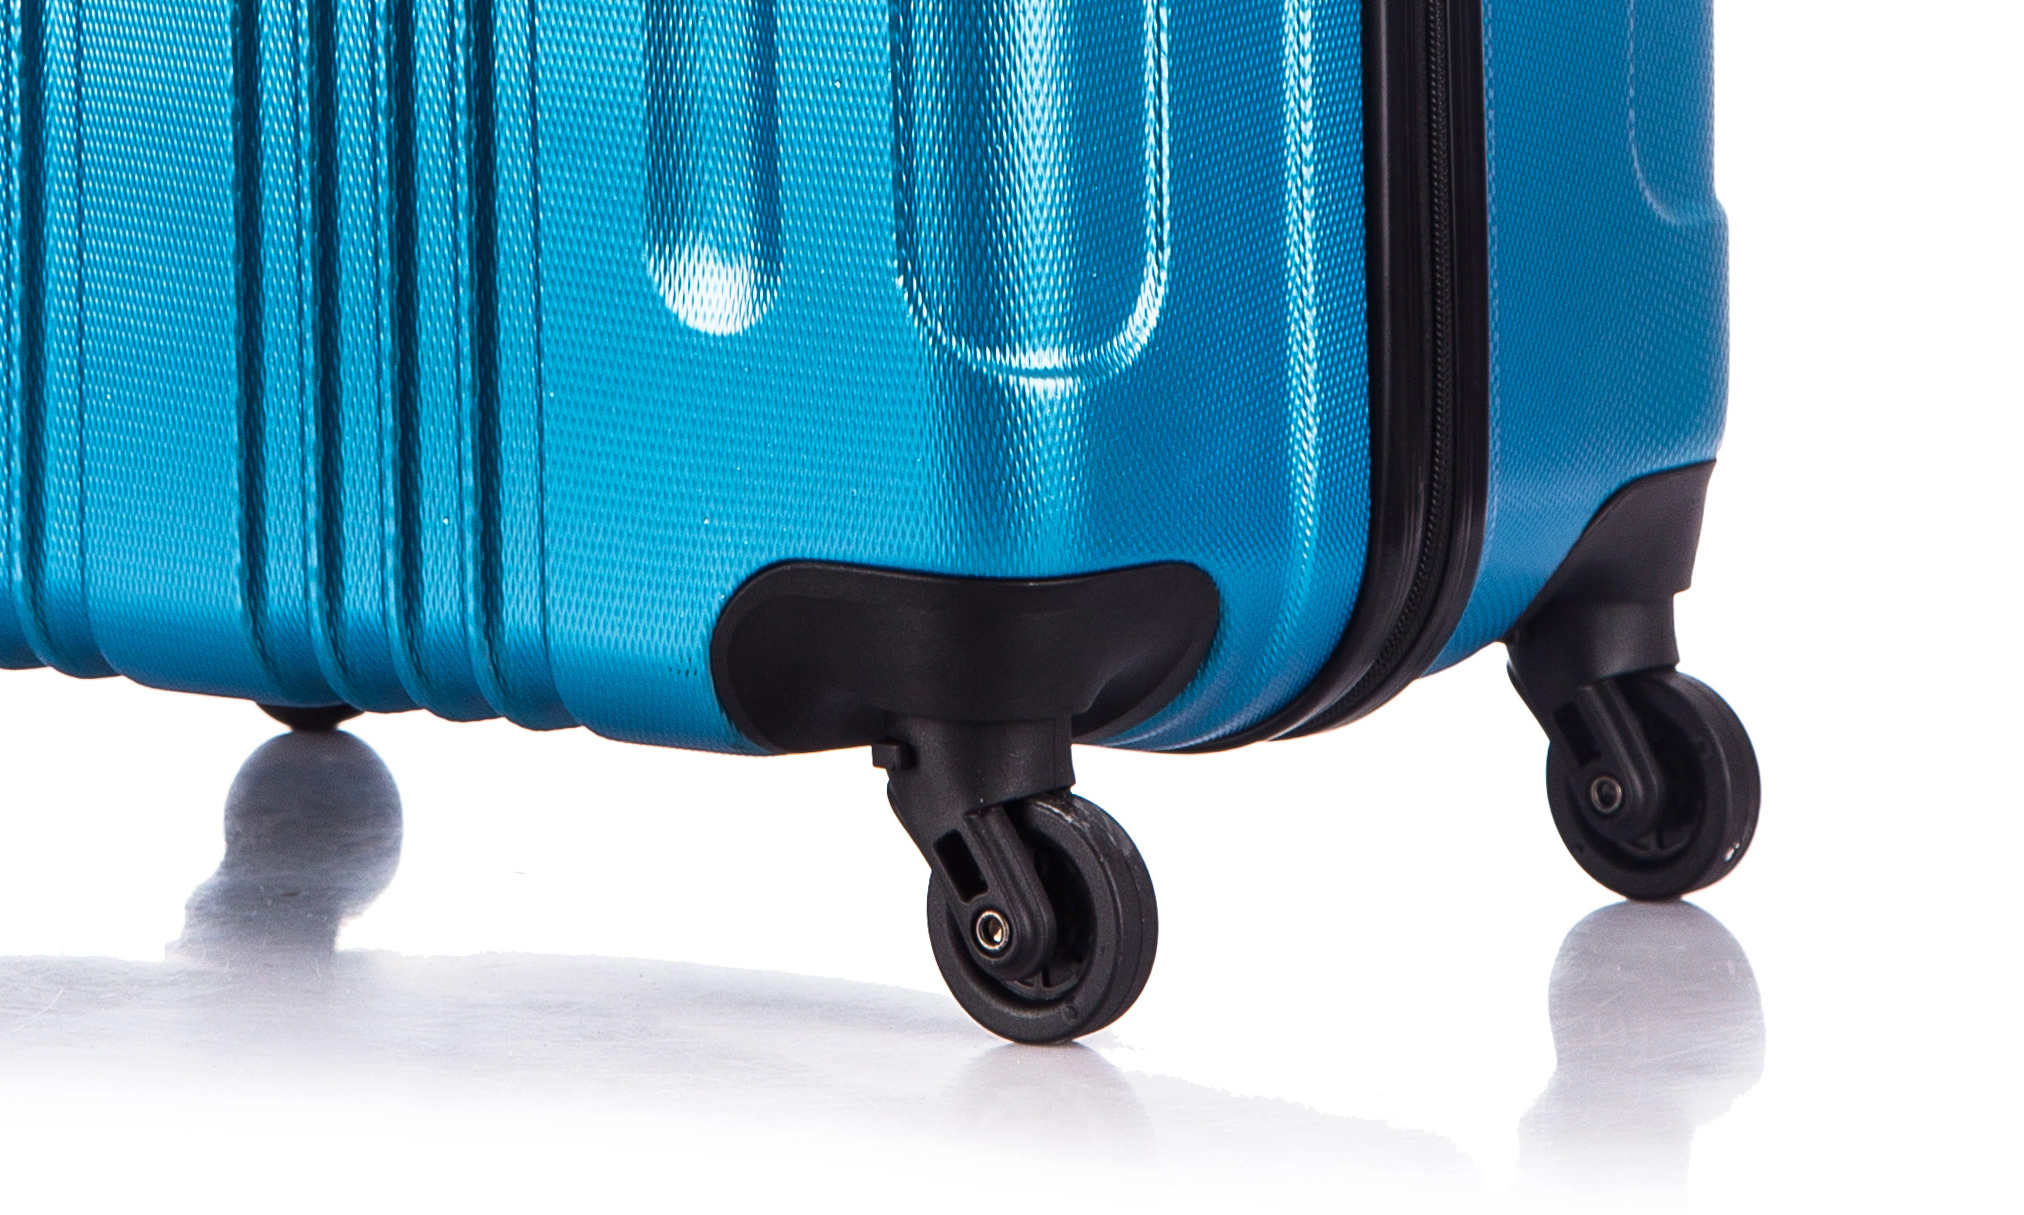 Чемодан со съемными колесами L'case Bangkok-22 Синий (M)